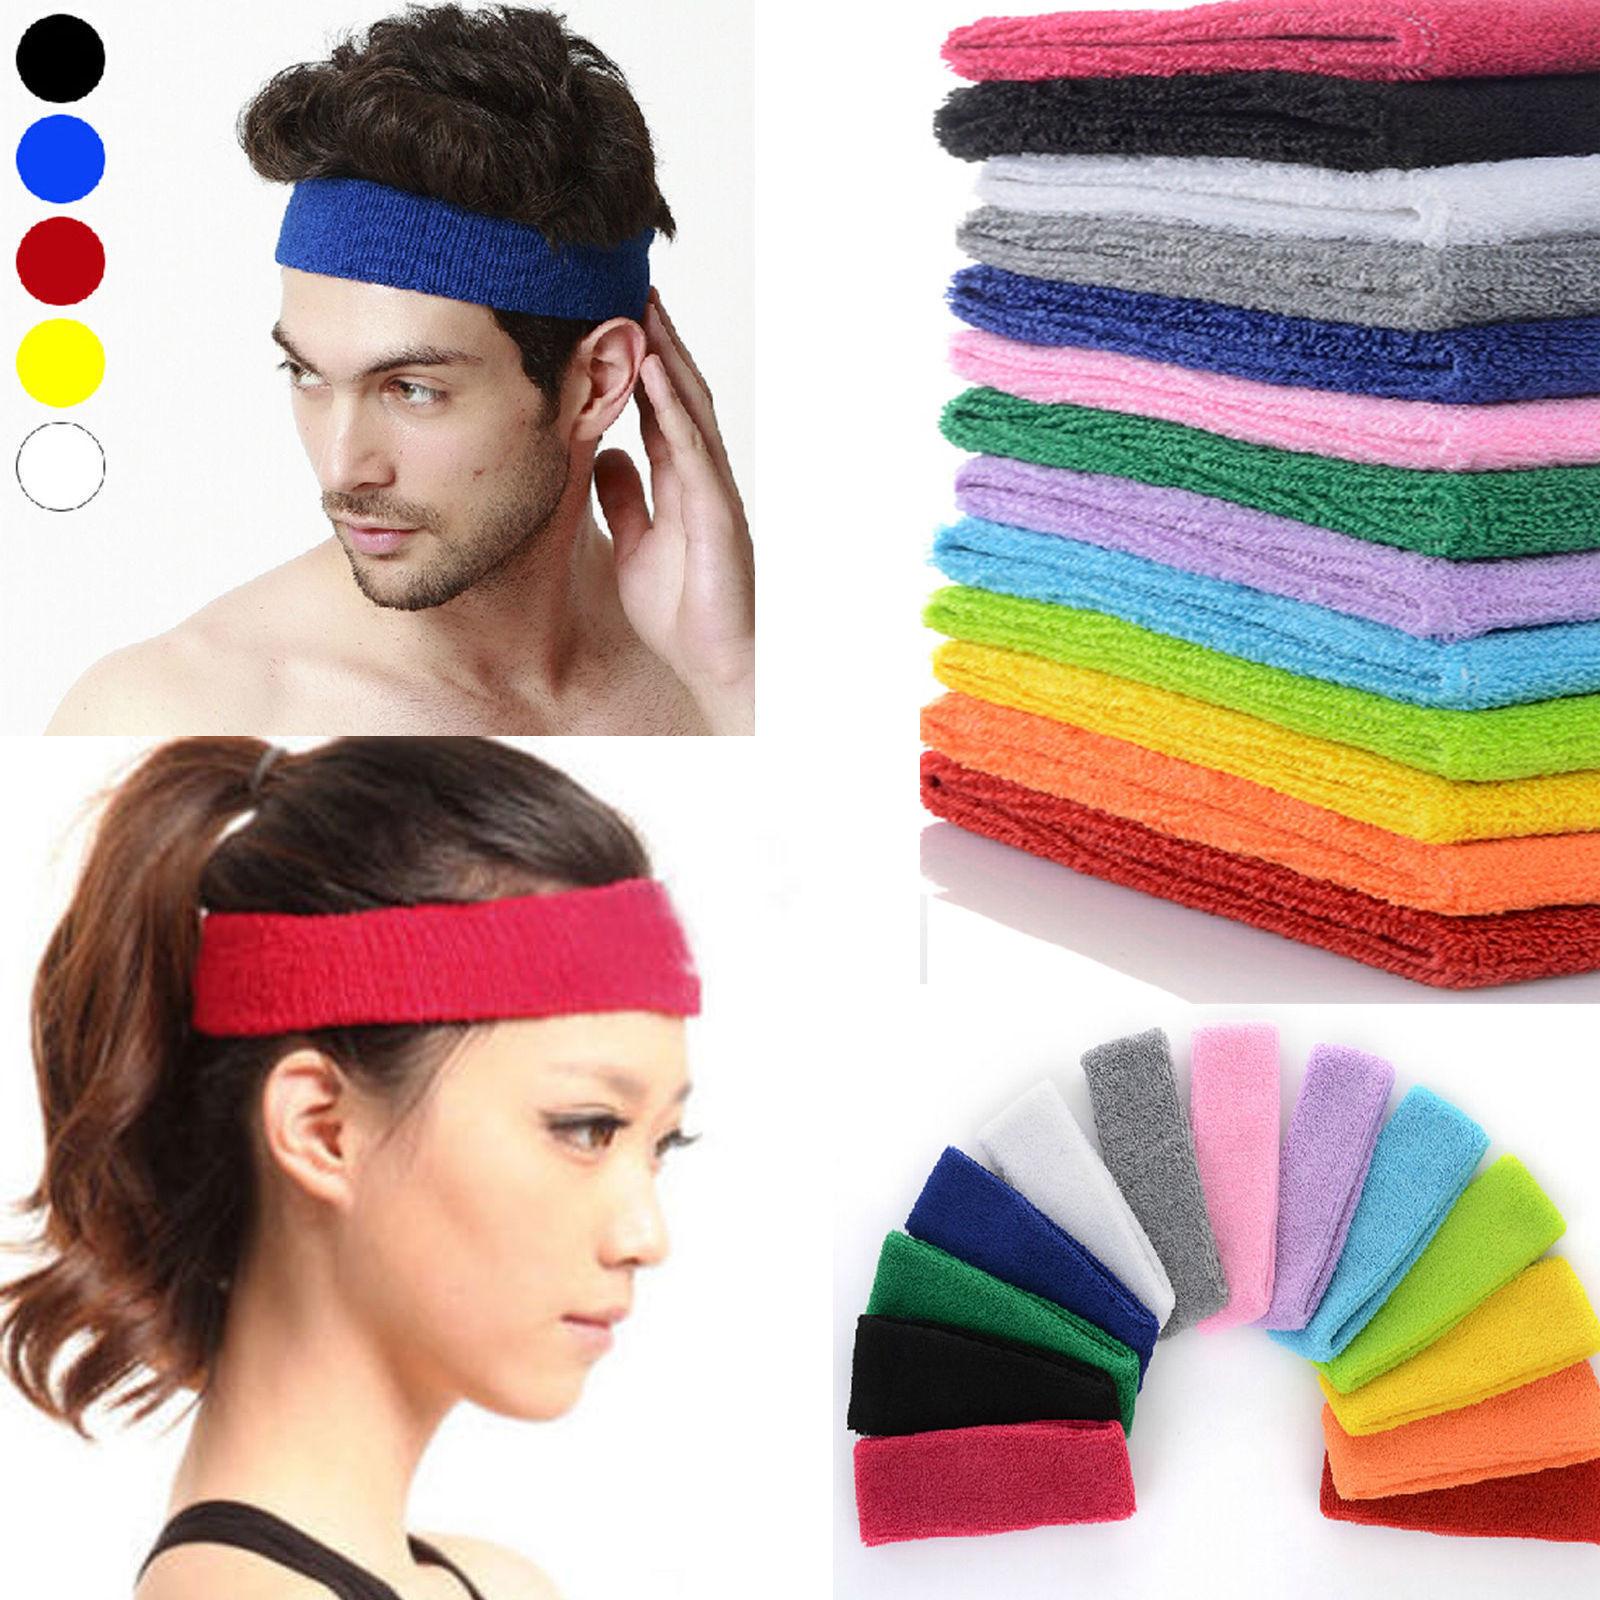 Cotton Men Women Sport Sweat Sweatband Headband Yoga/Gym Stretch Hair Head Band Adjustable Bboy Caps Outdoor Sun